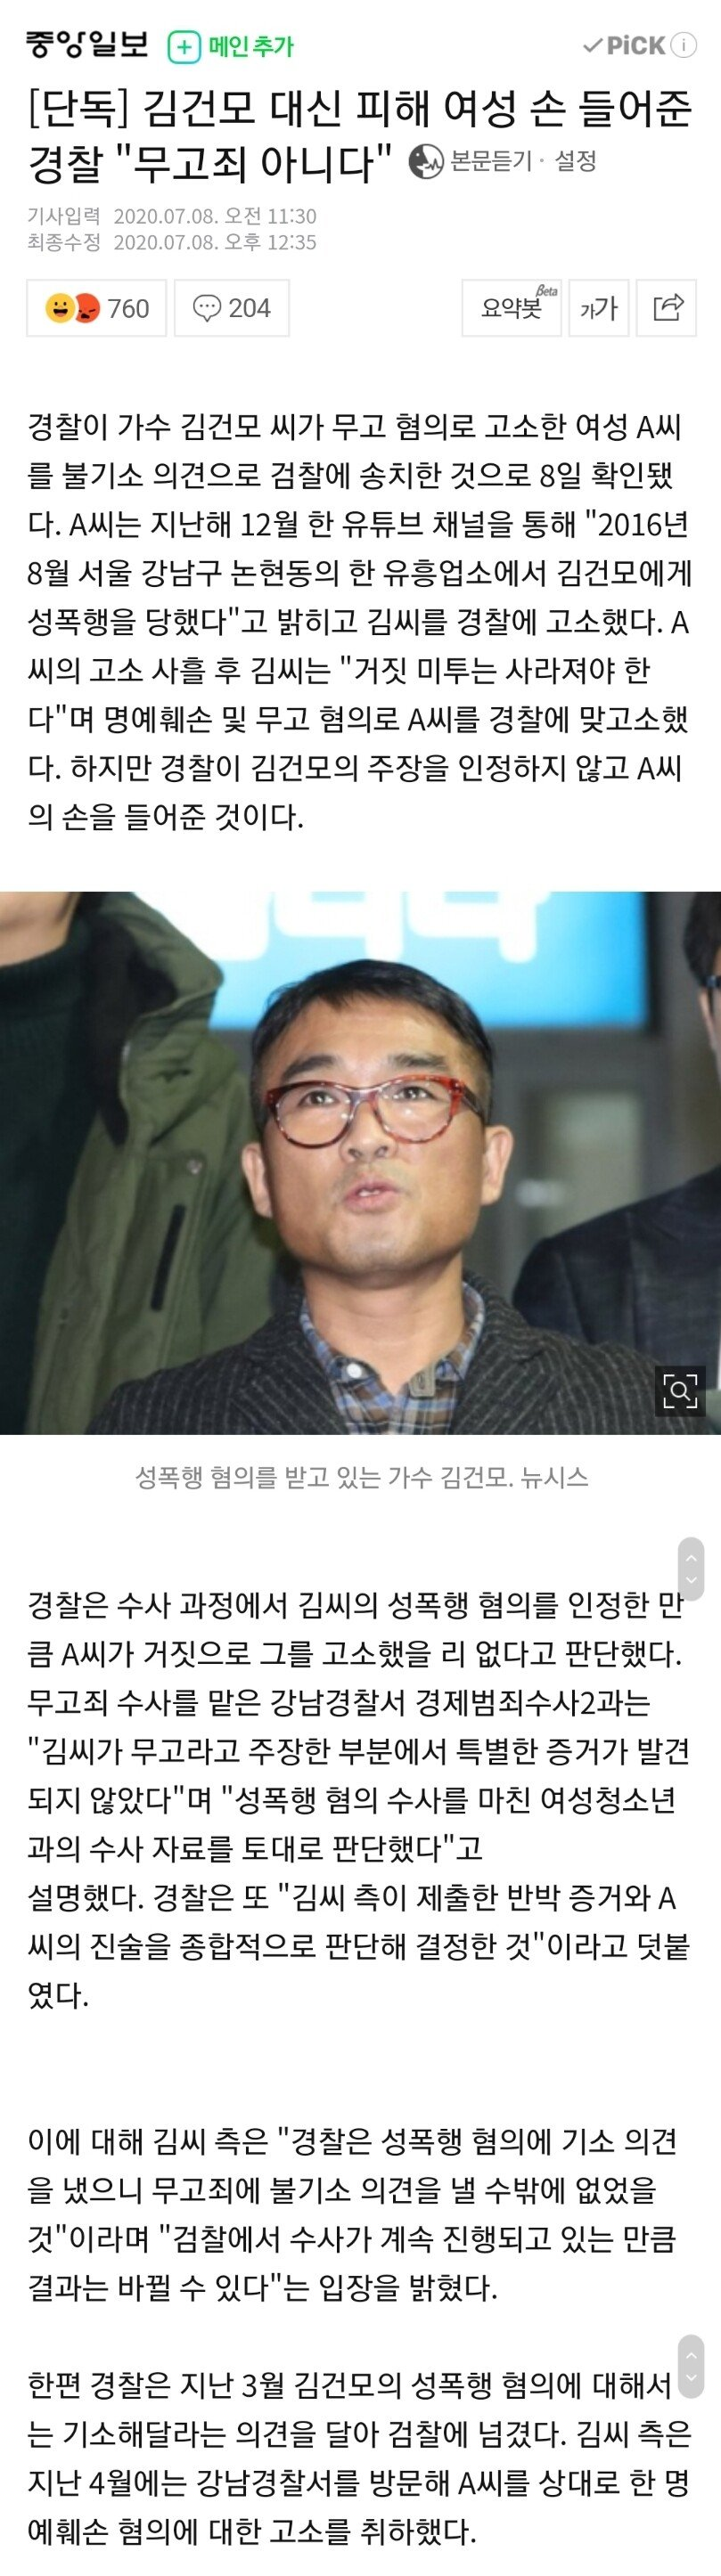 Screenshot_20200708-132946_Samsung Internet.jpg 김건모 사건 근황.gisa